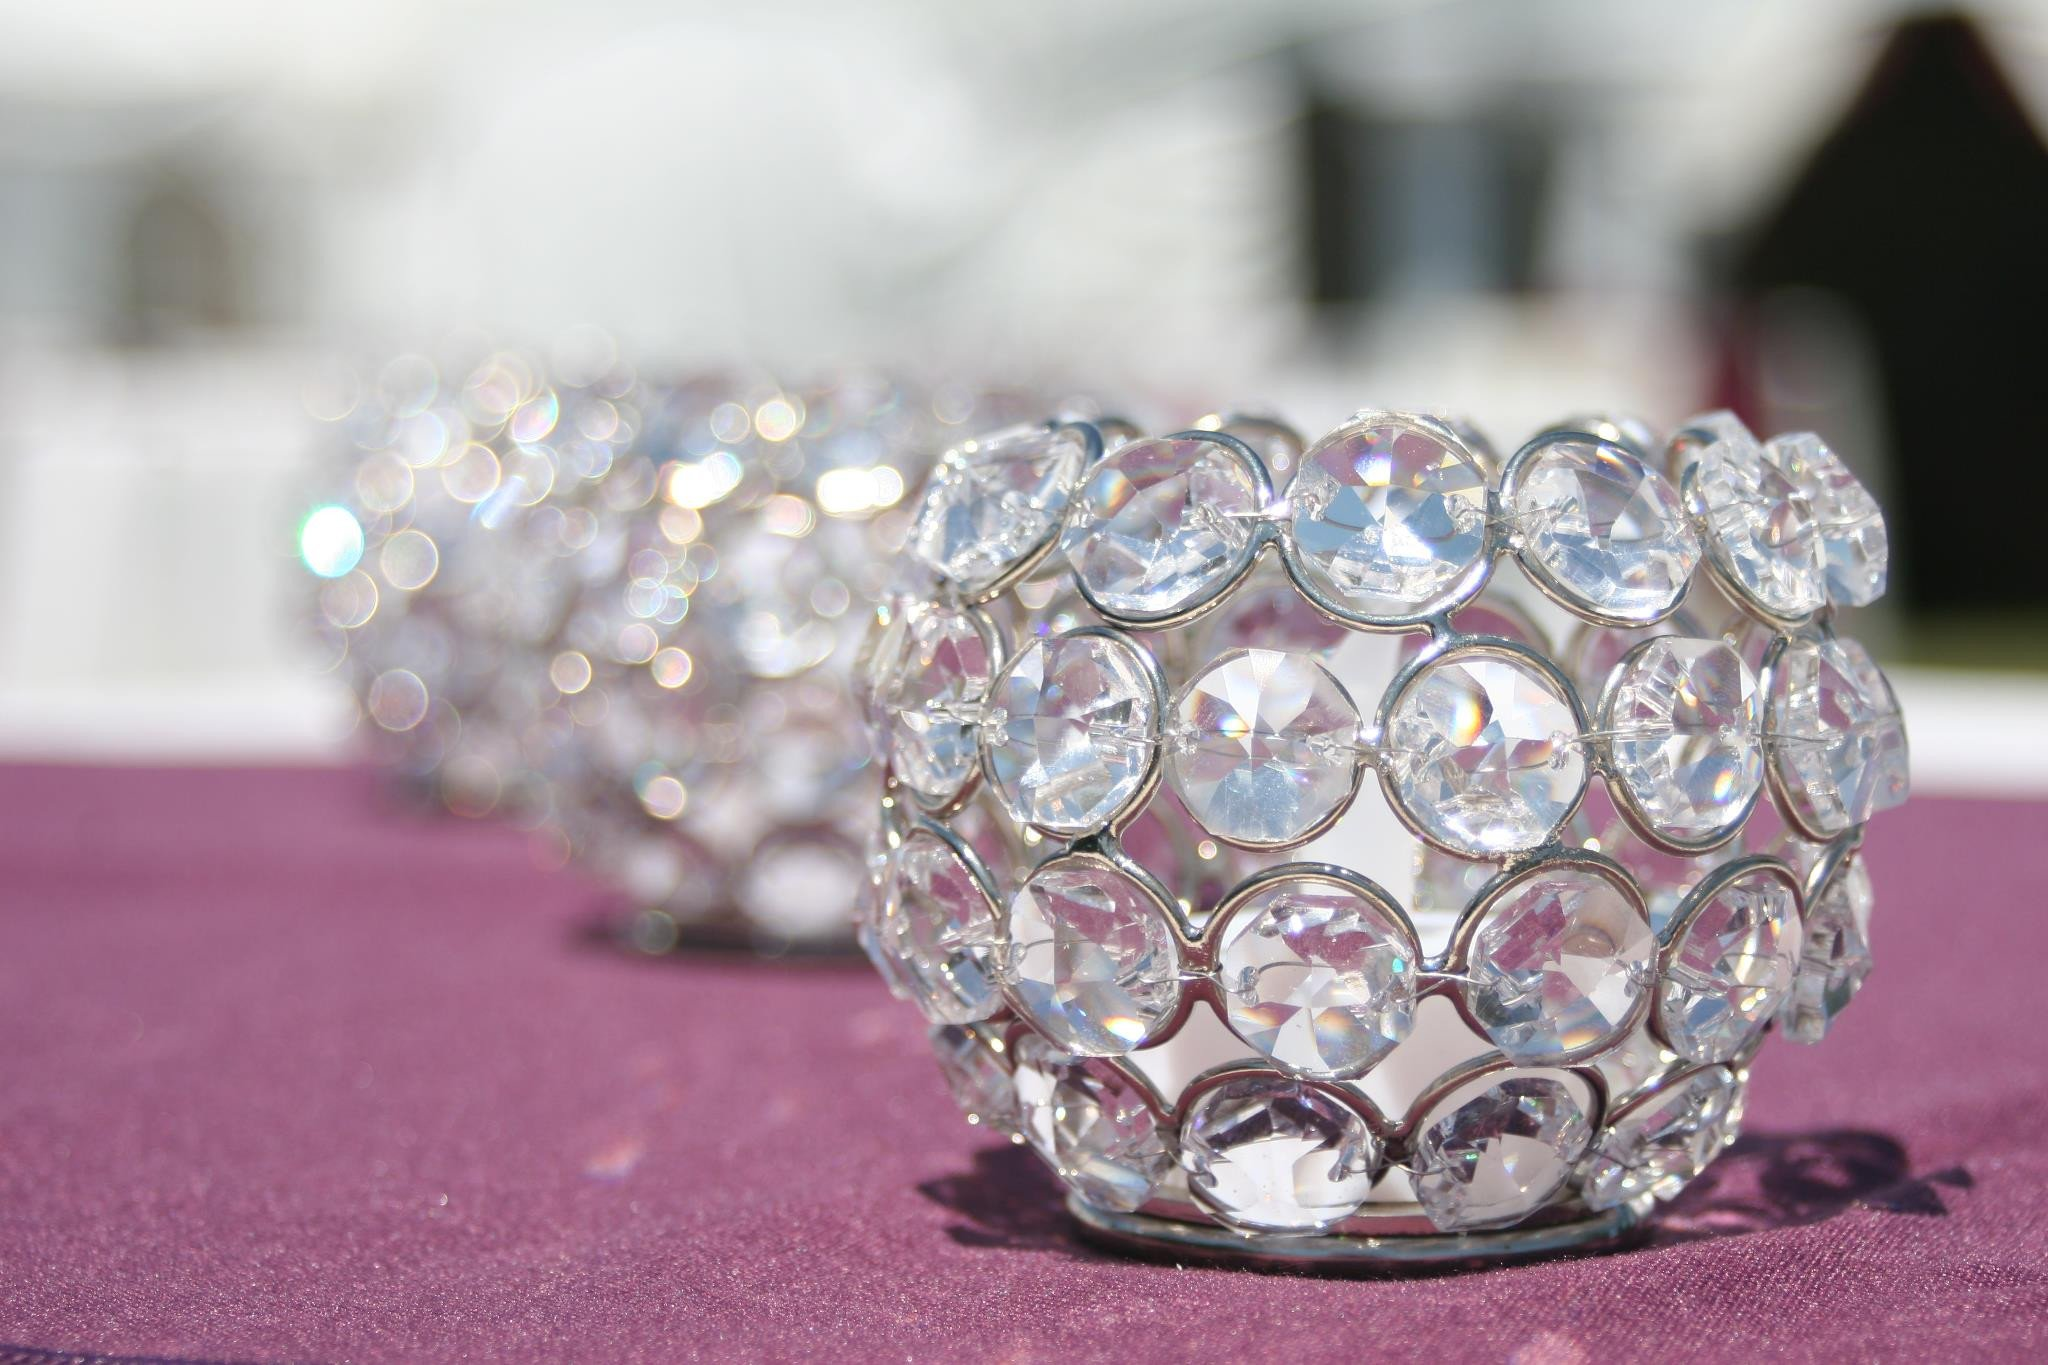 Crystal Votive Cups Image